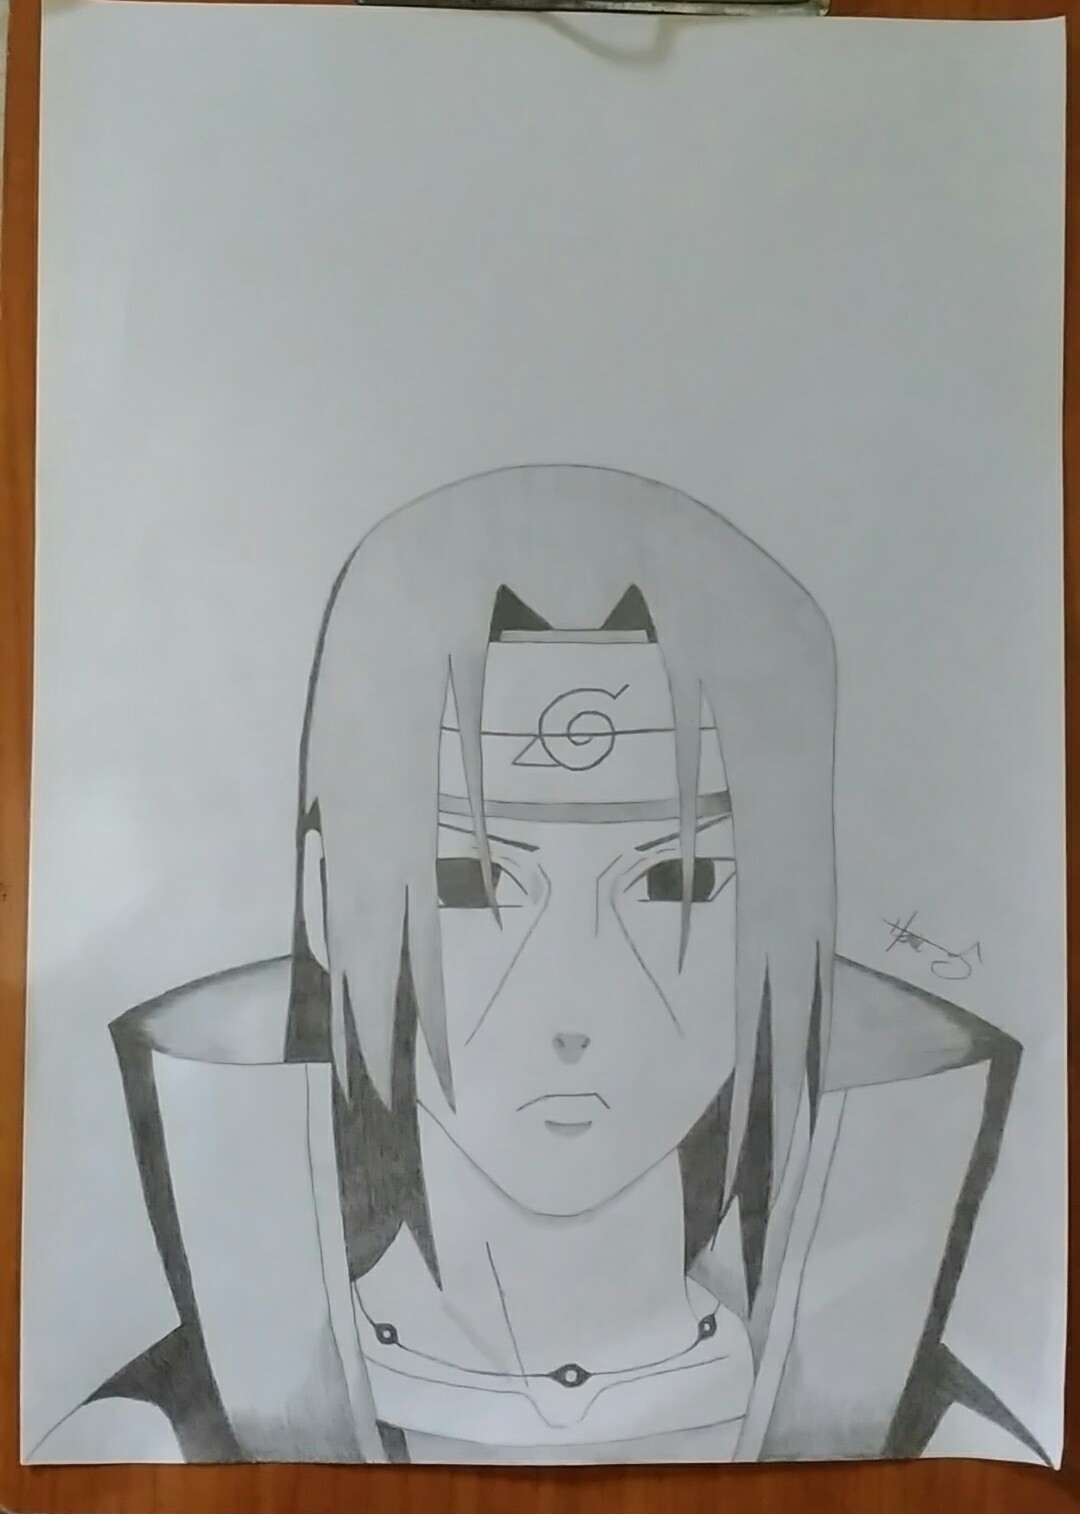 87 Gambar Gambar Naruto Arsiran Terlihat Keren